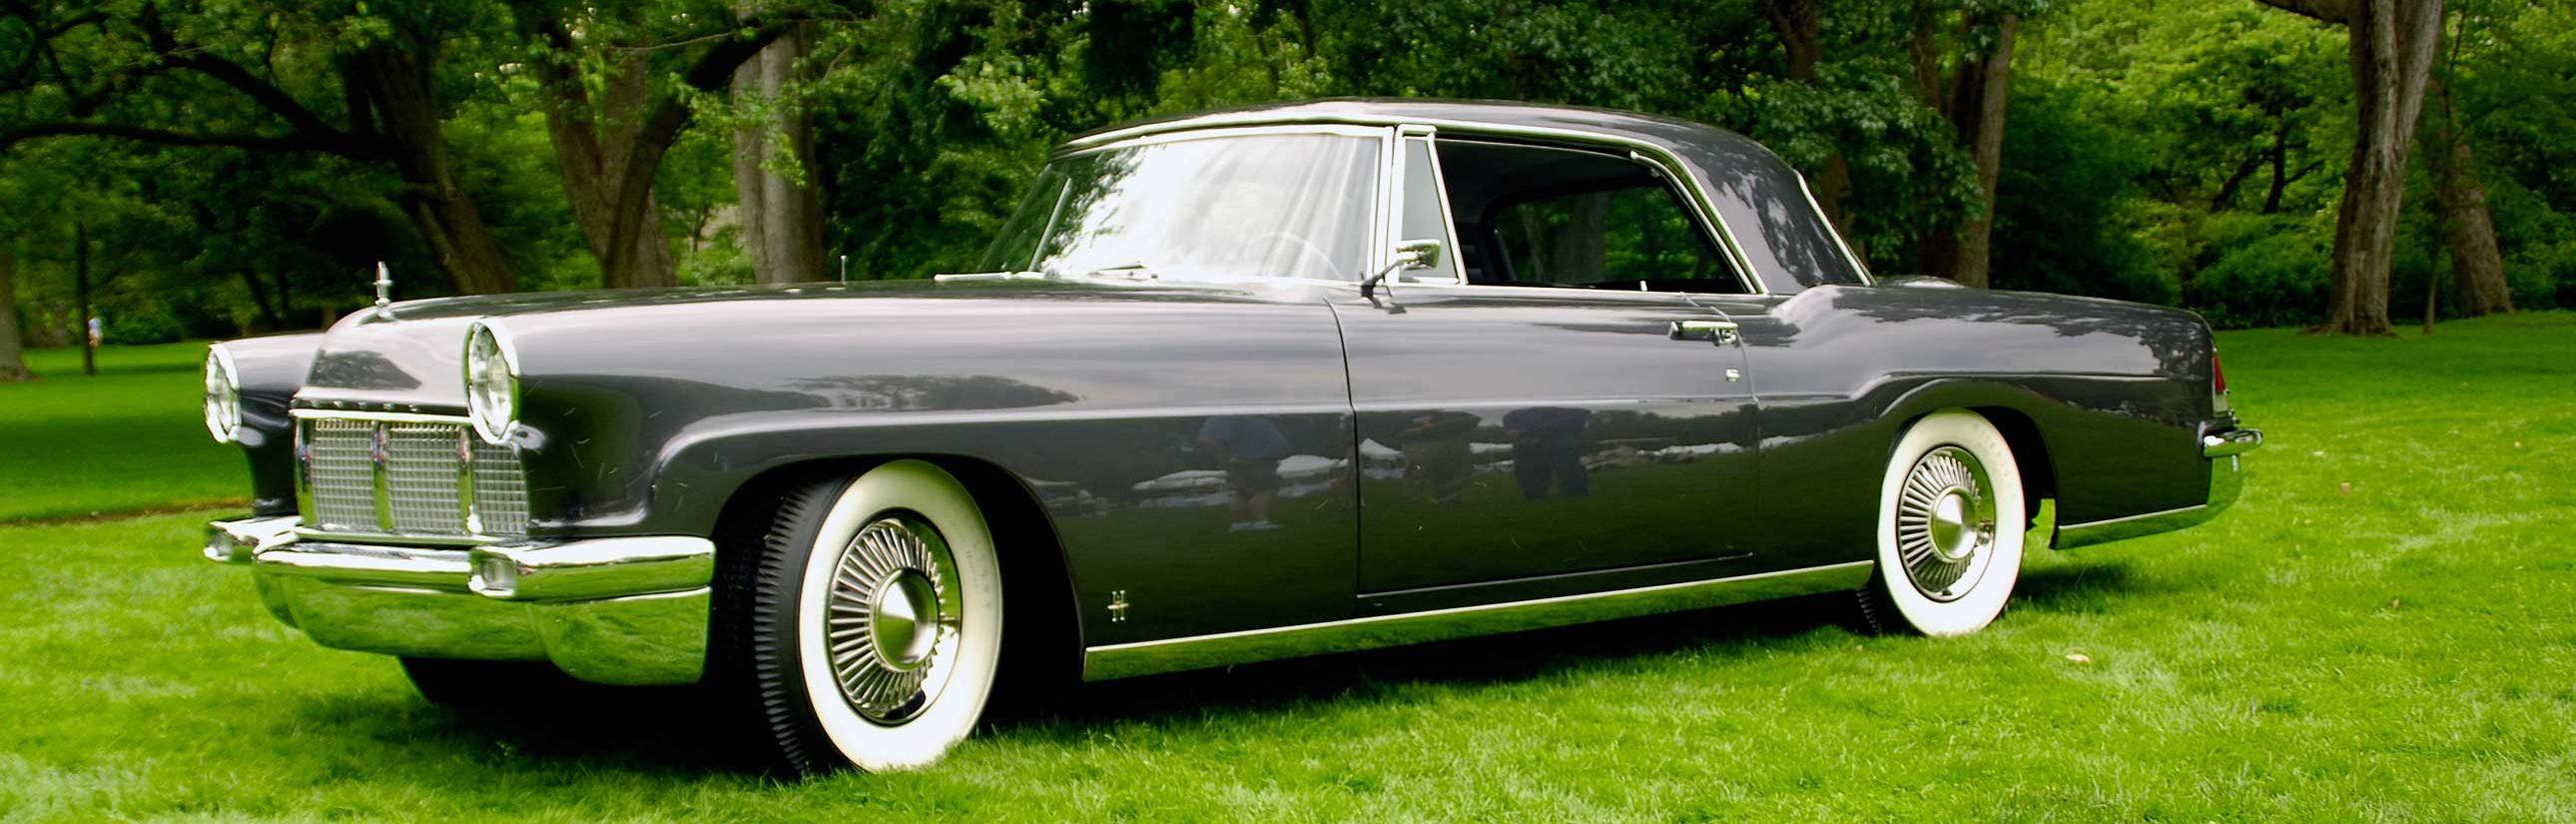 1956 Continental Mark II C56 J 3348 Leon Flagg Curt Lamon